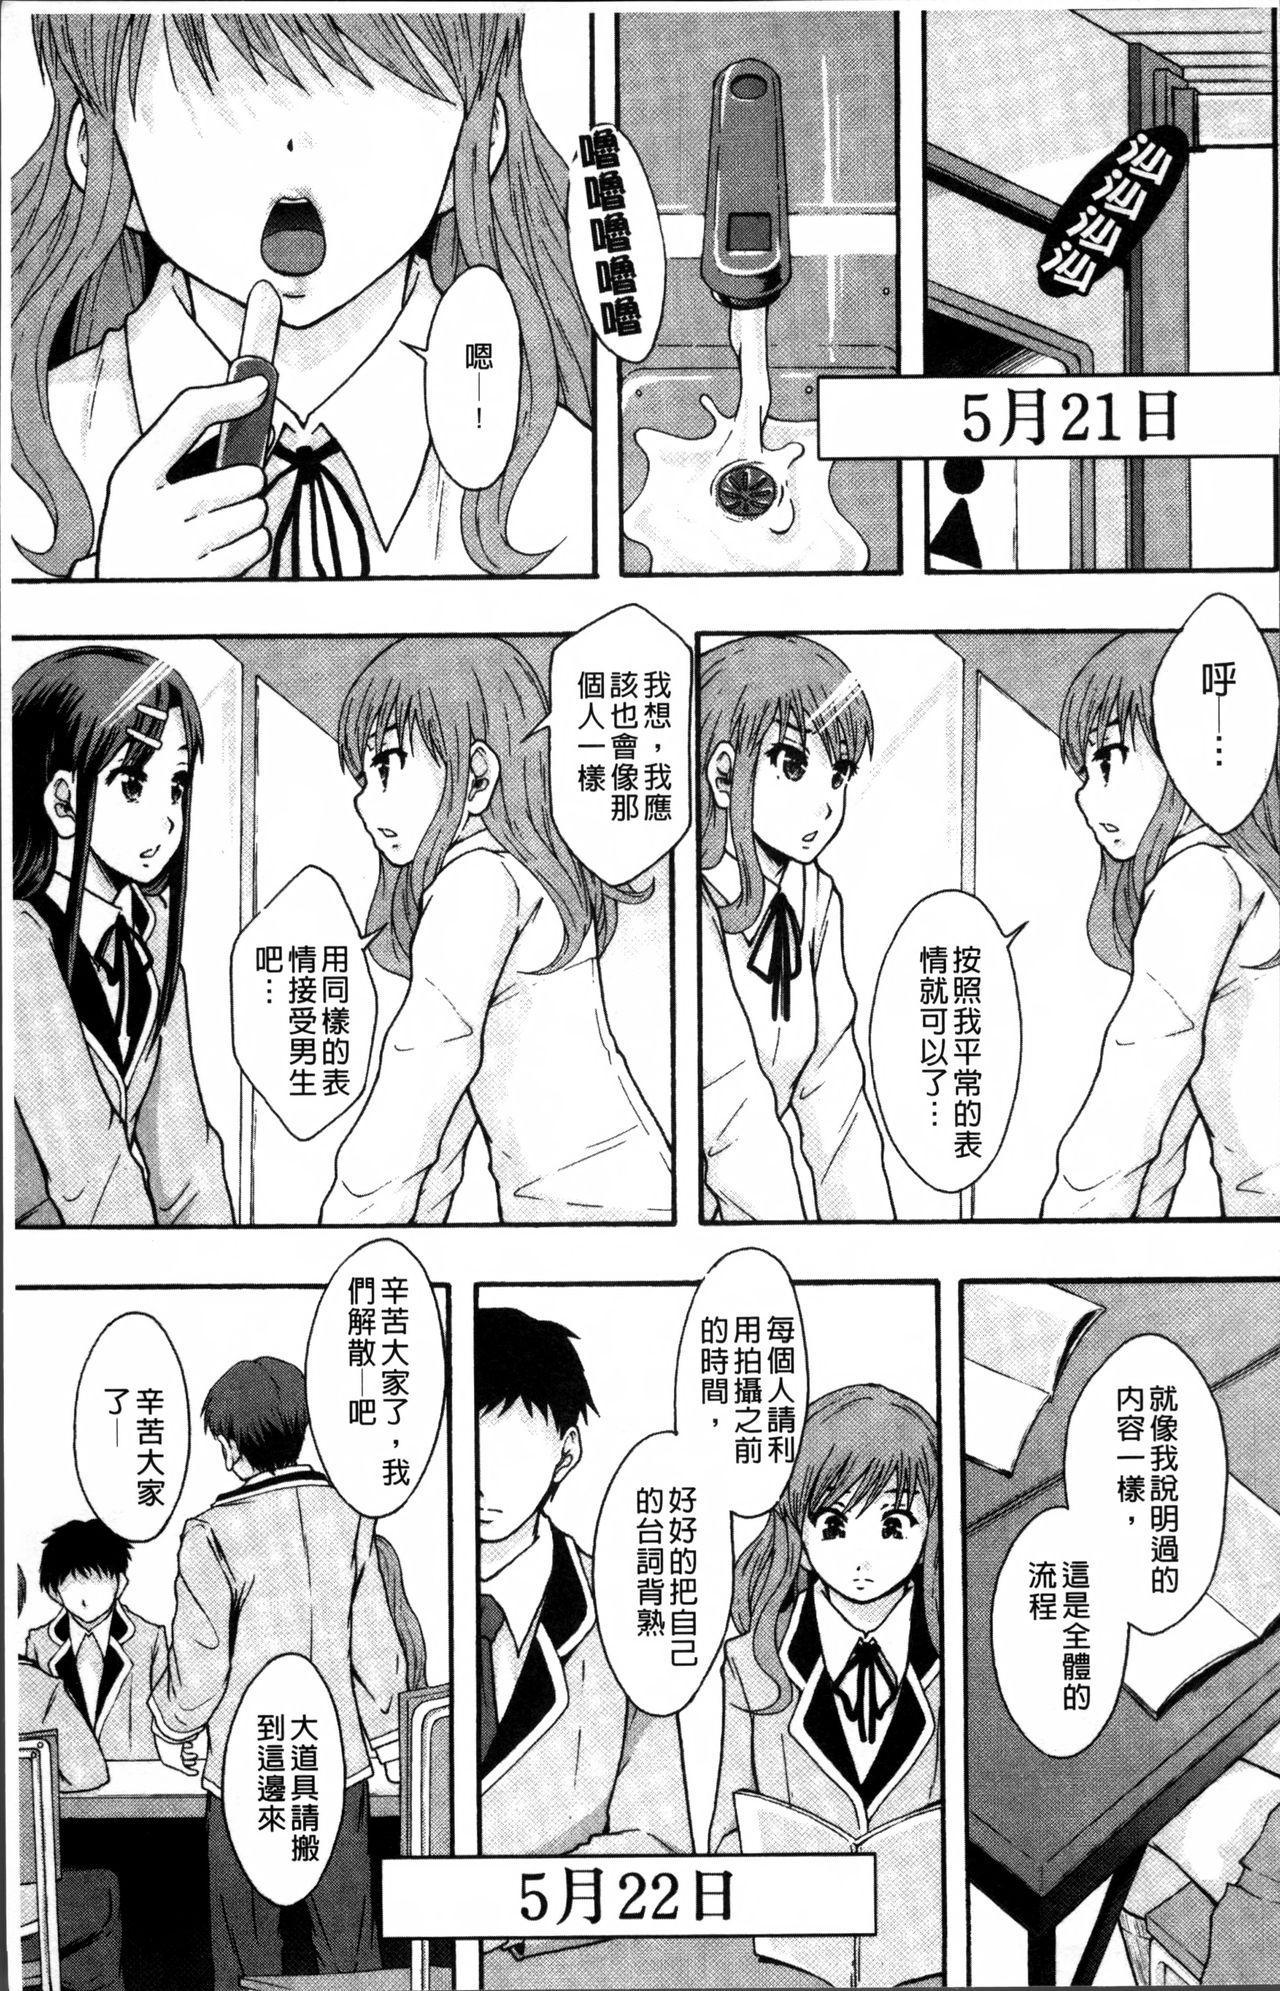 Anoko no Class wa AV-ka 33